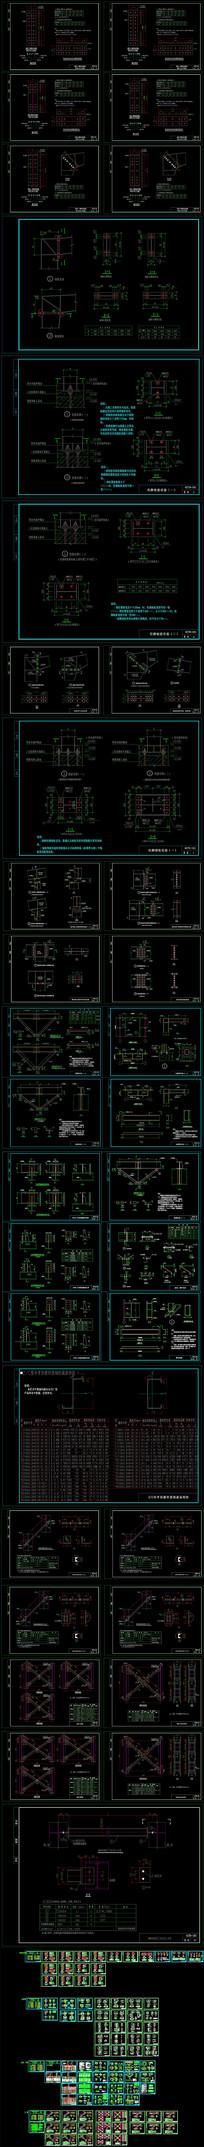 CAD钢结构节点整套图纸